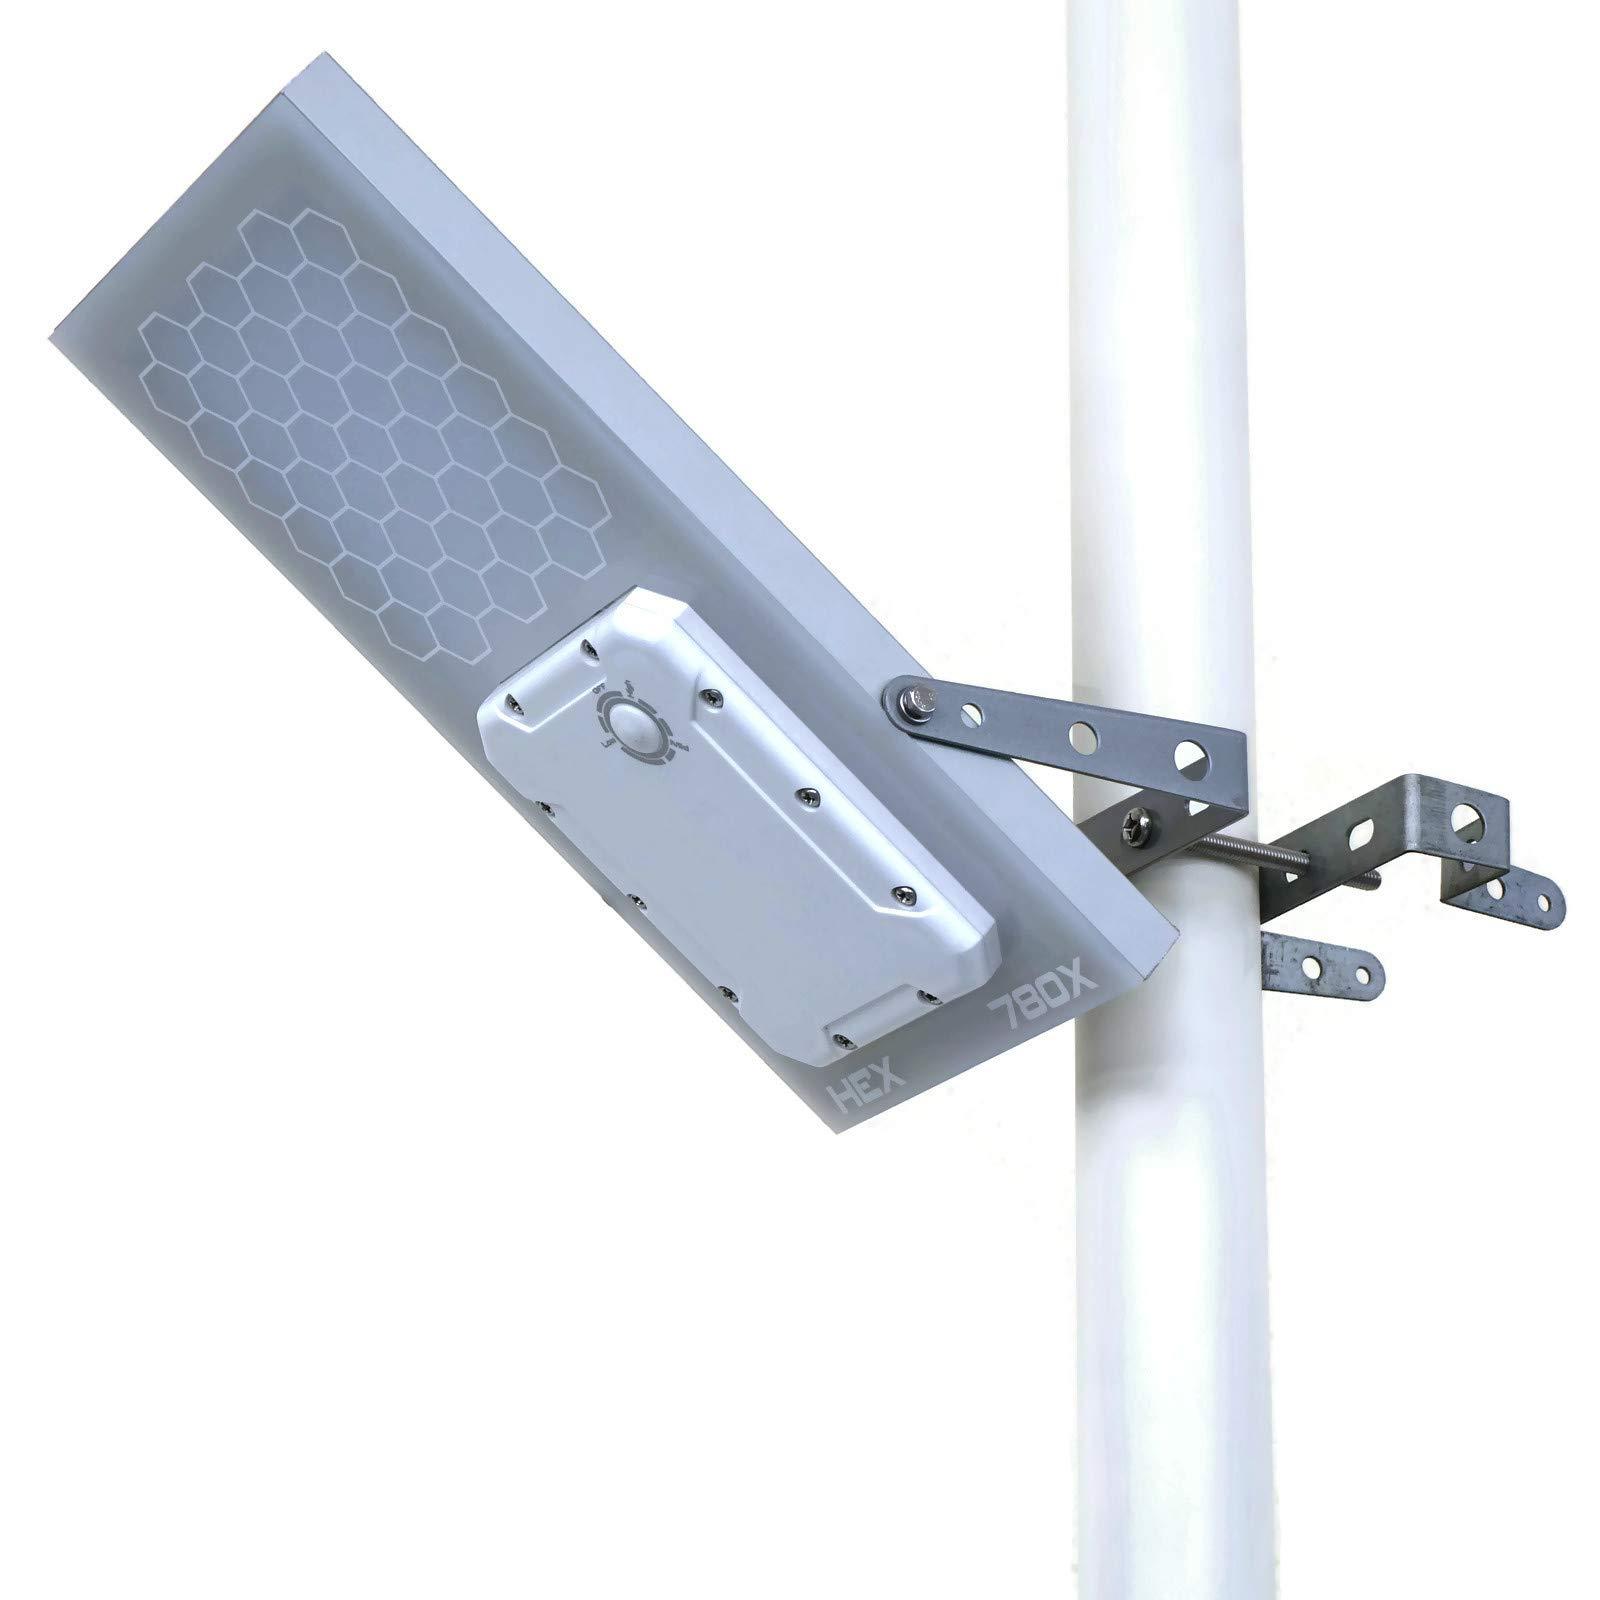 Solar Street Light // HEX 780X Solar Street Light (Warm White LED) // 3-Level Power Setting // Fits Max Pole Diameter 2.5''